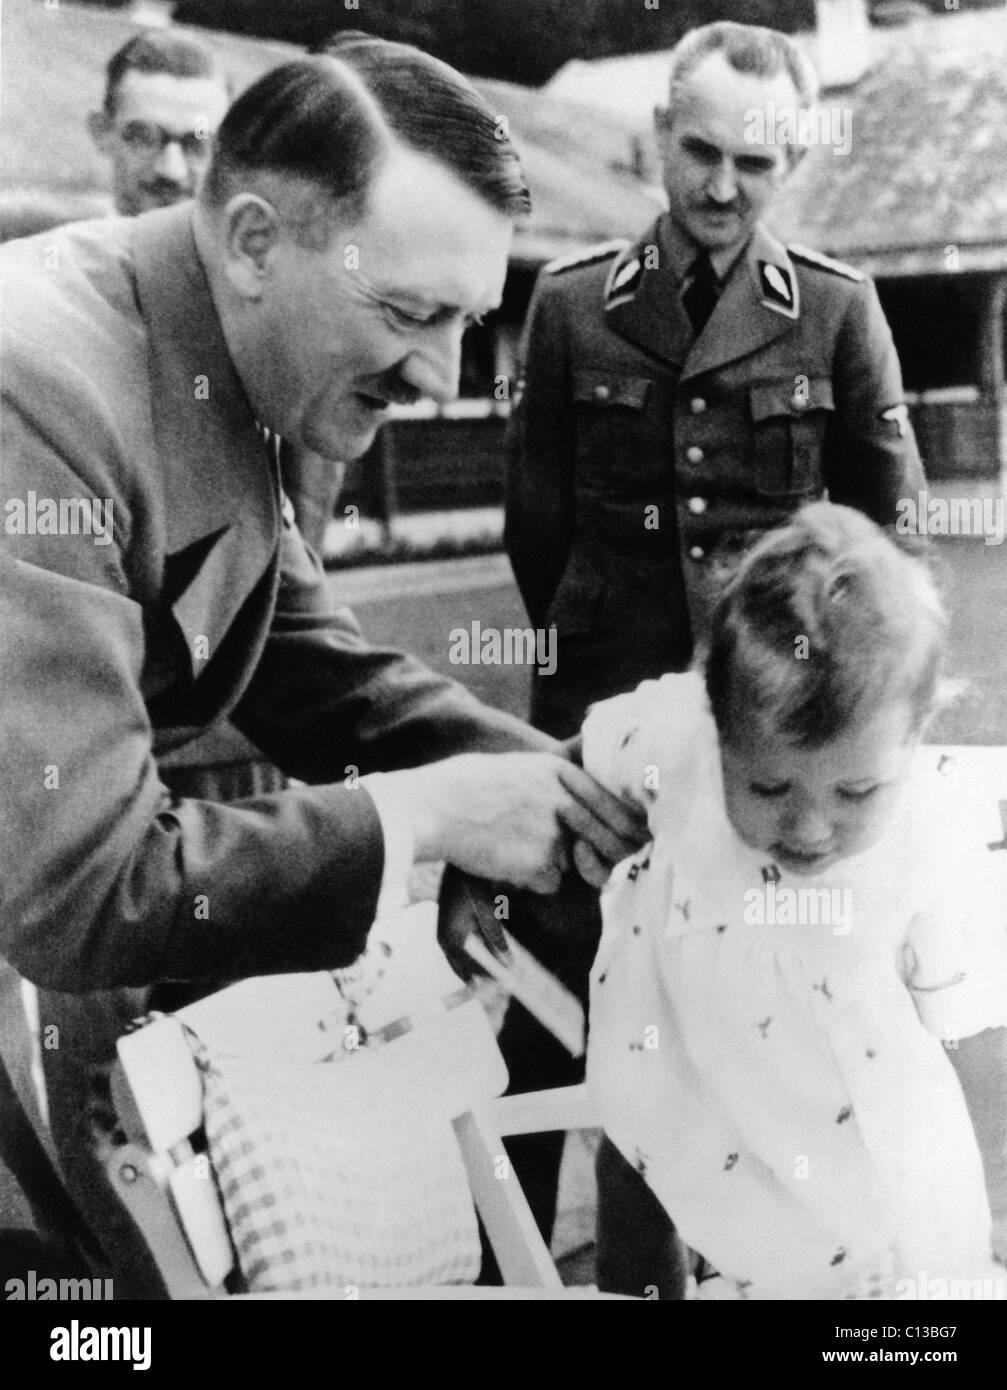 Adolf Hitler, ca. 1930s - Stock Image